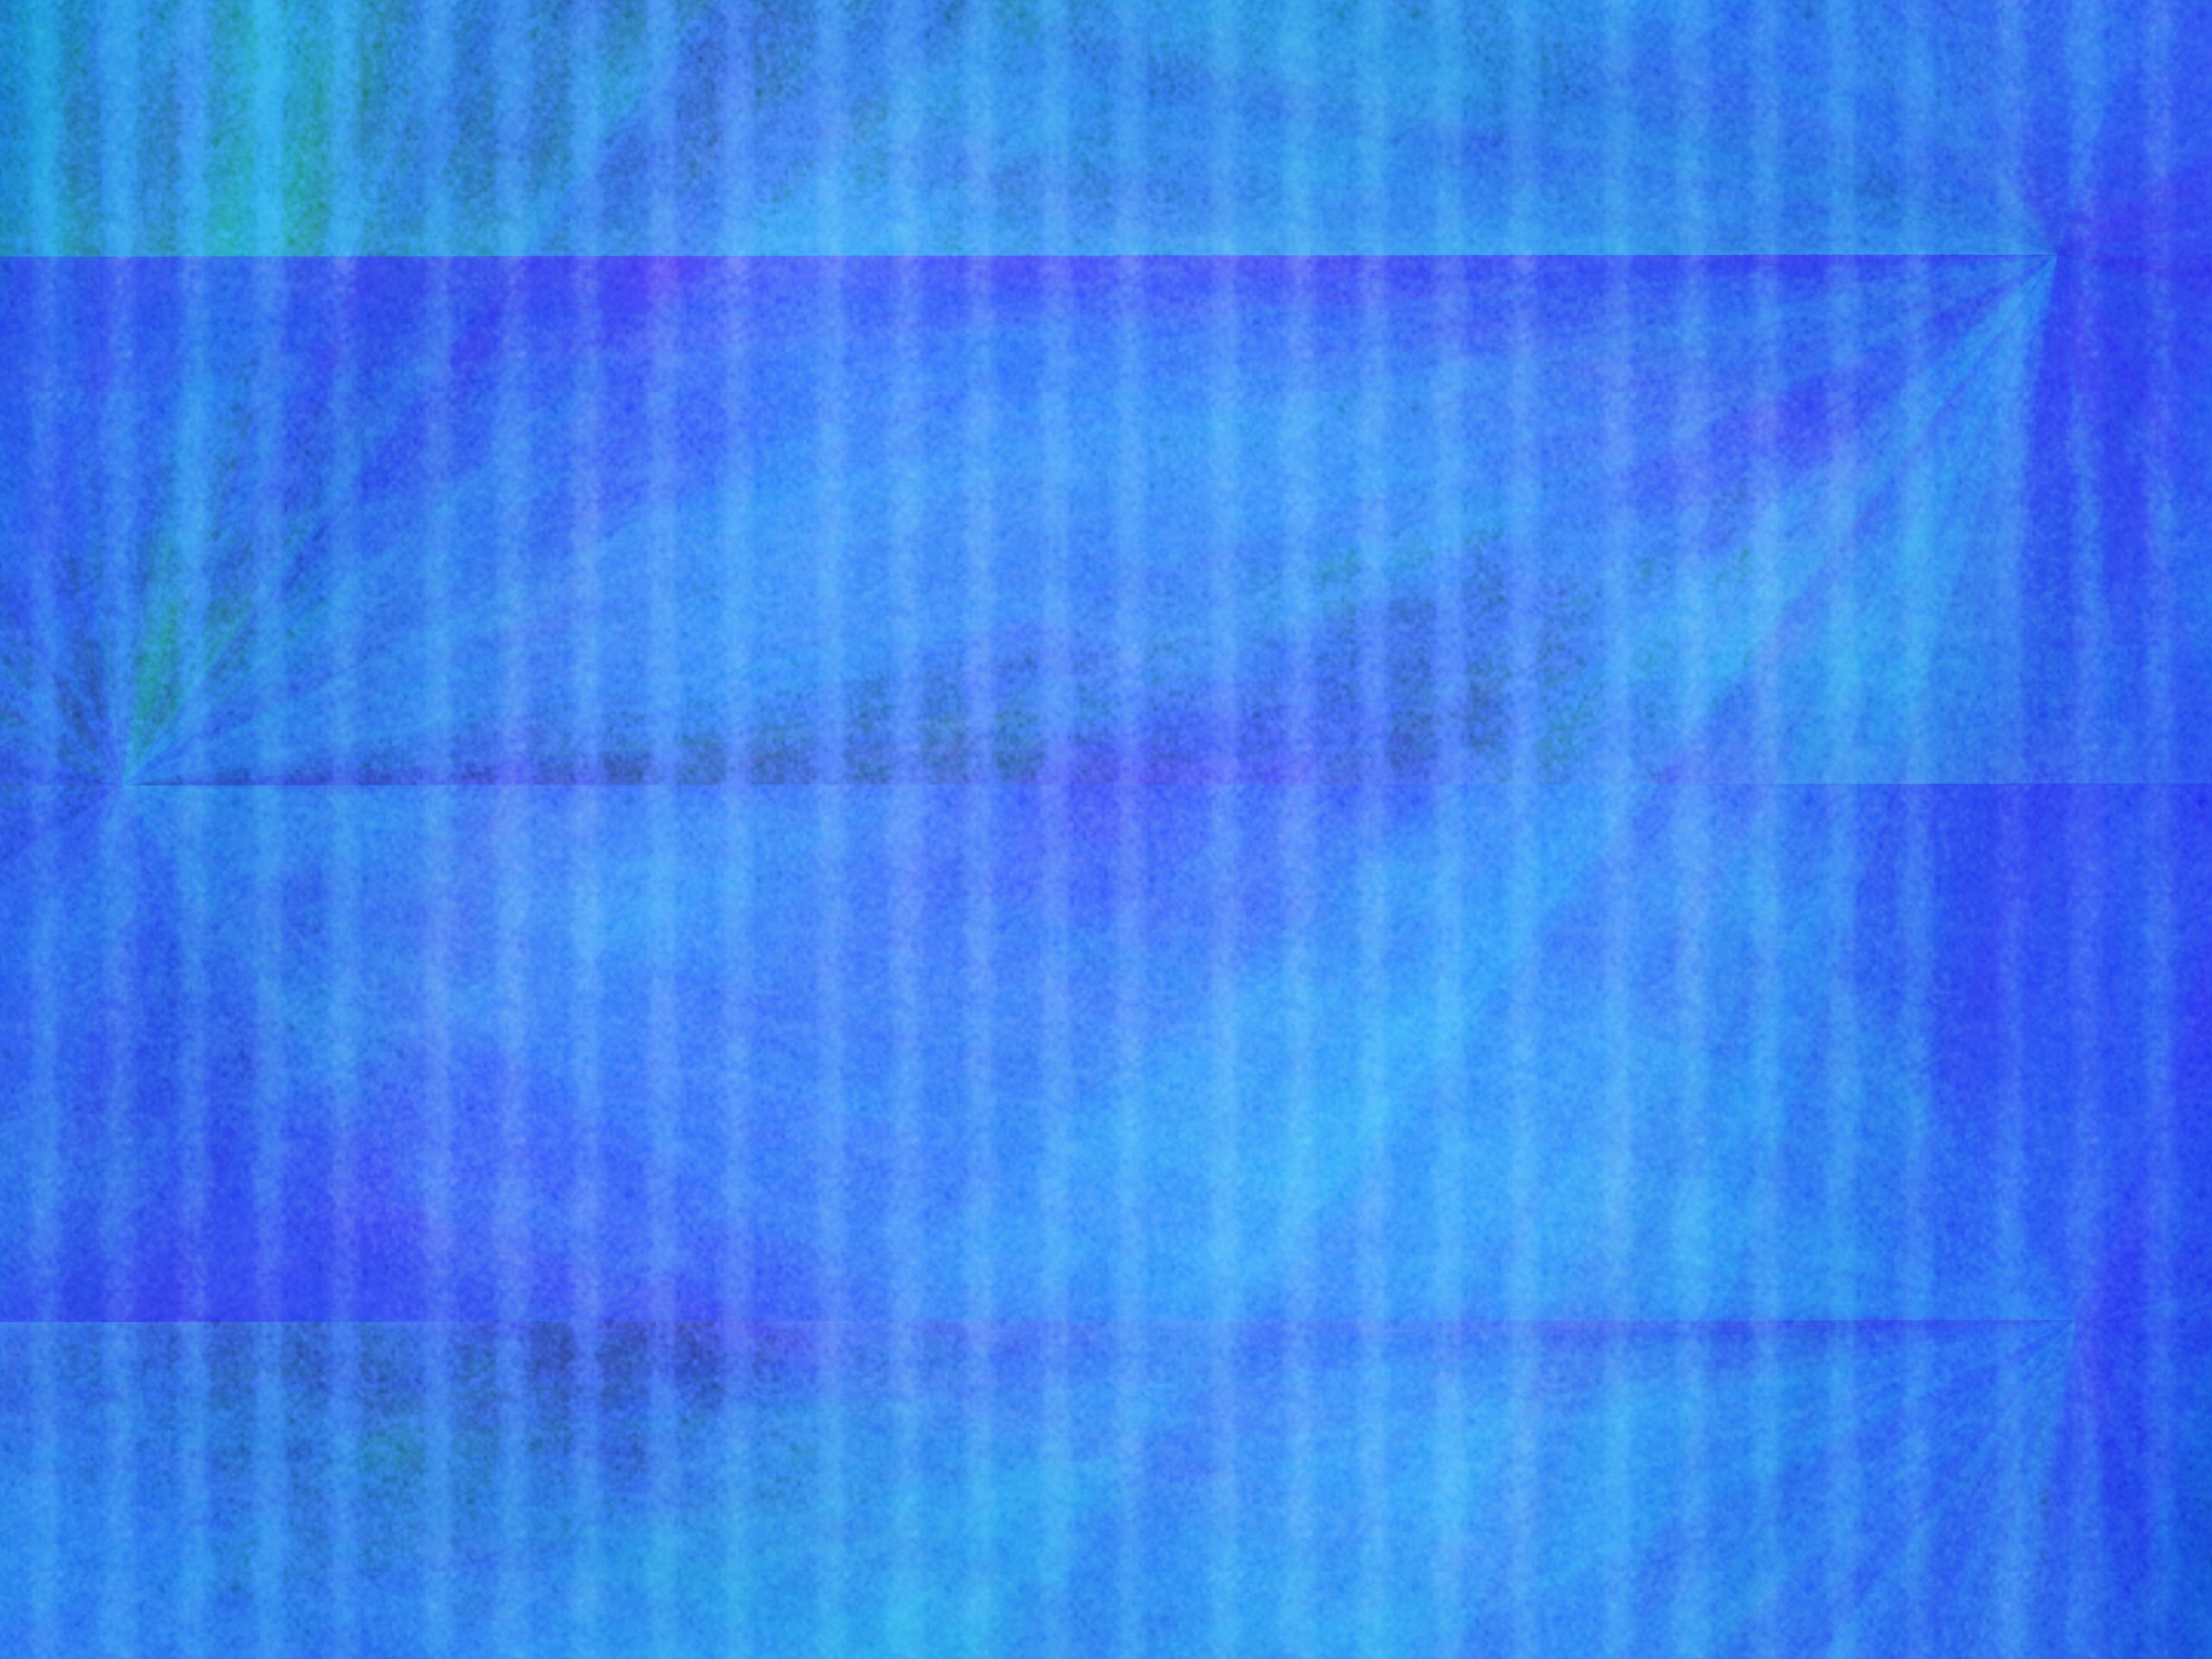 A sky blue wallpaper